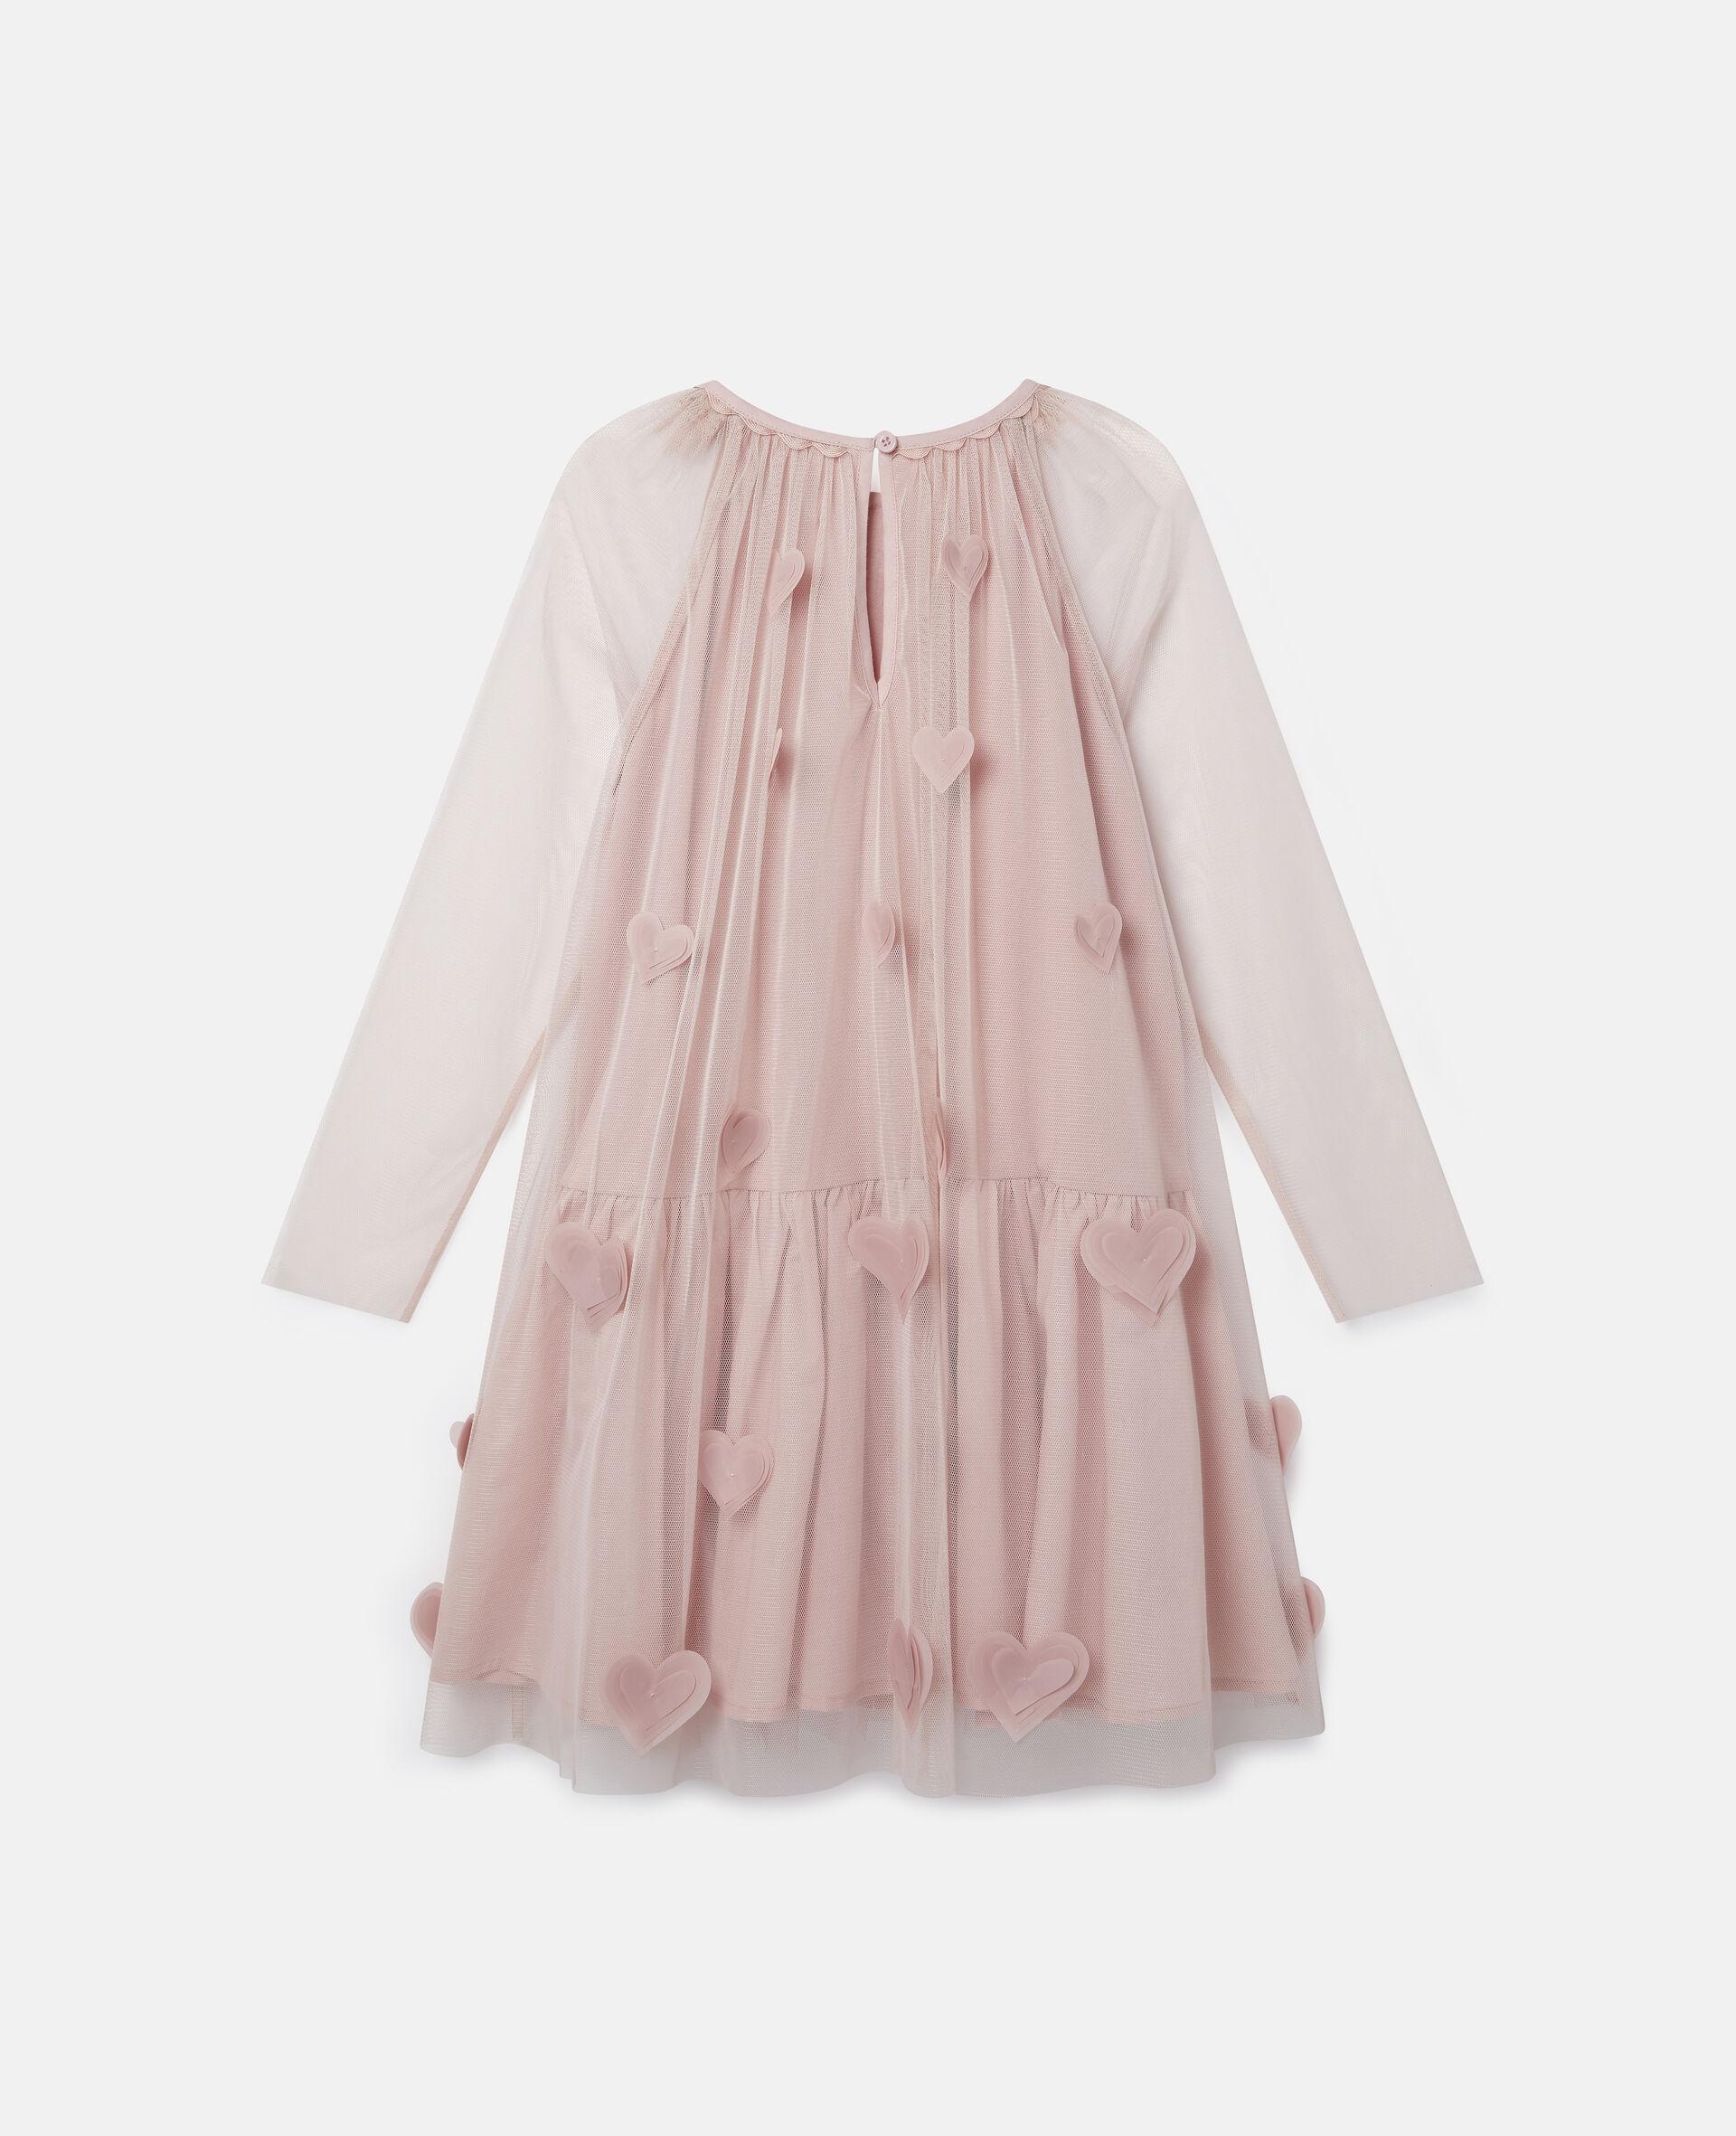 3D Hearts Tulle Dress-Pink-large image number 3